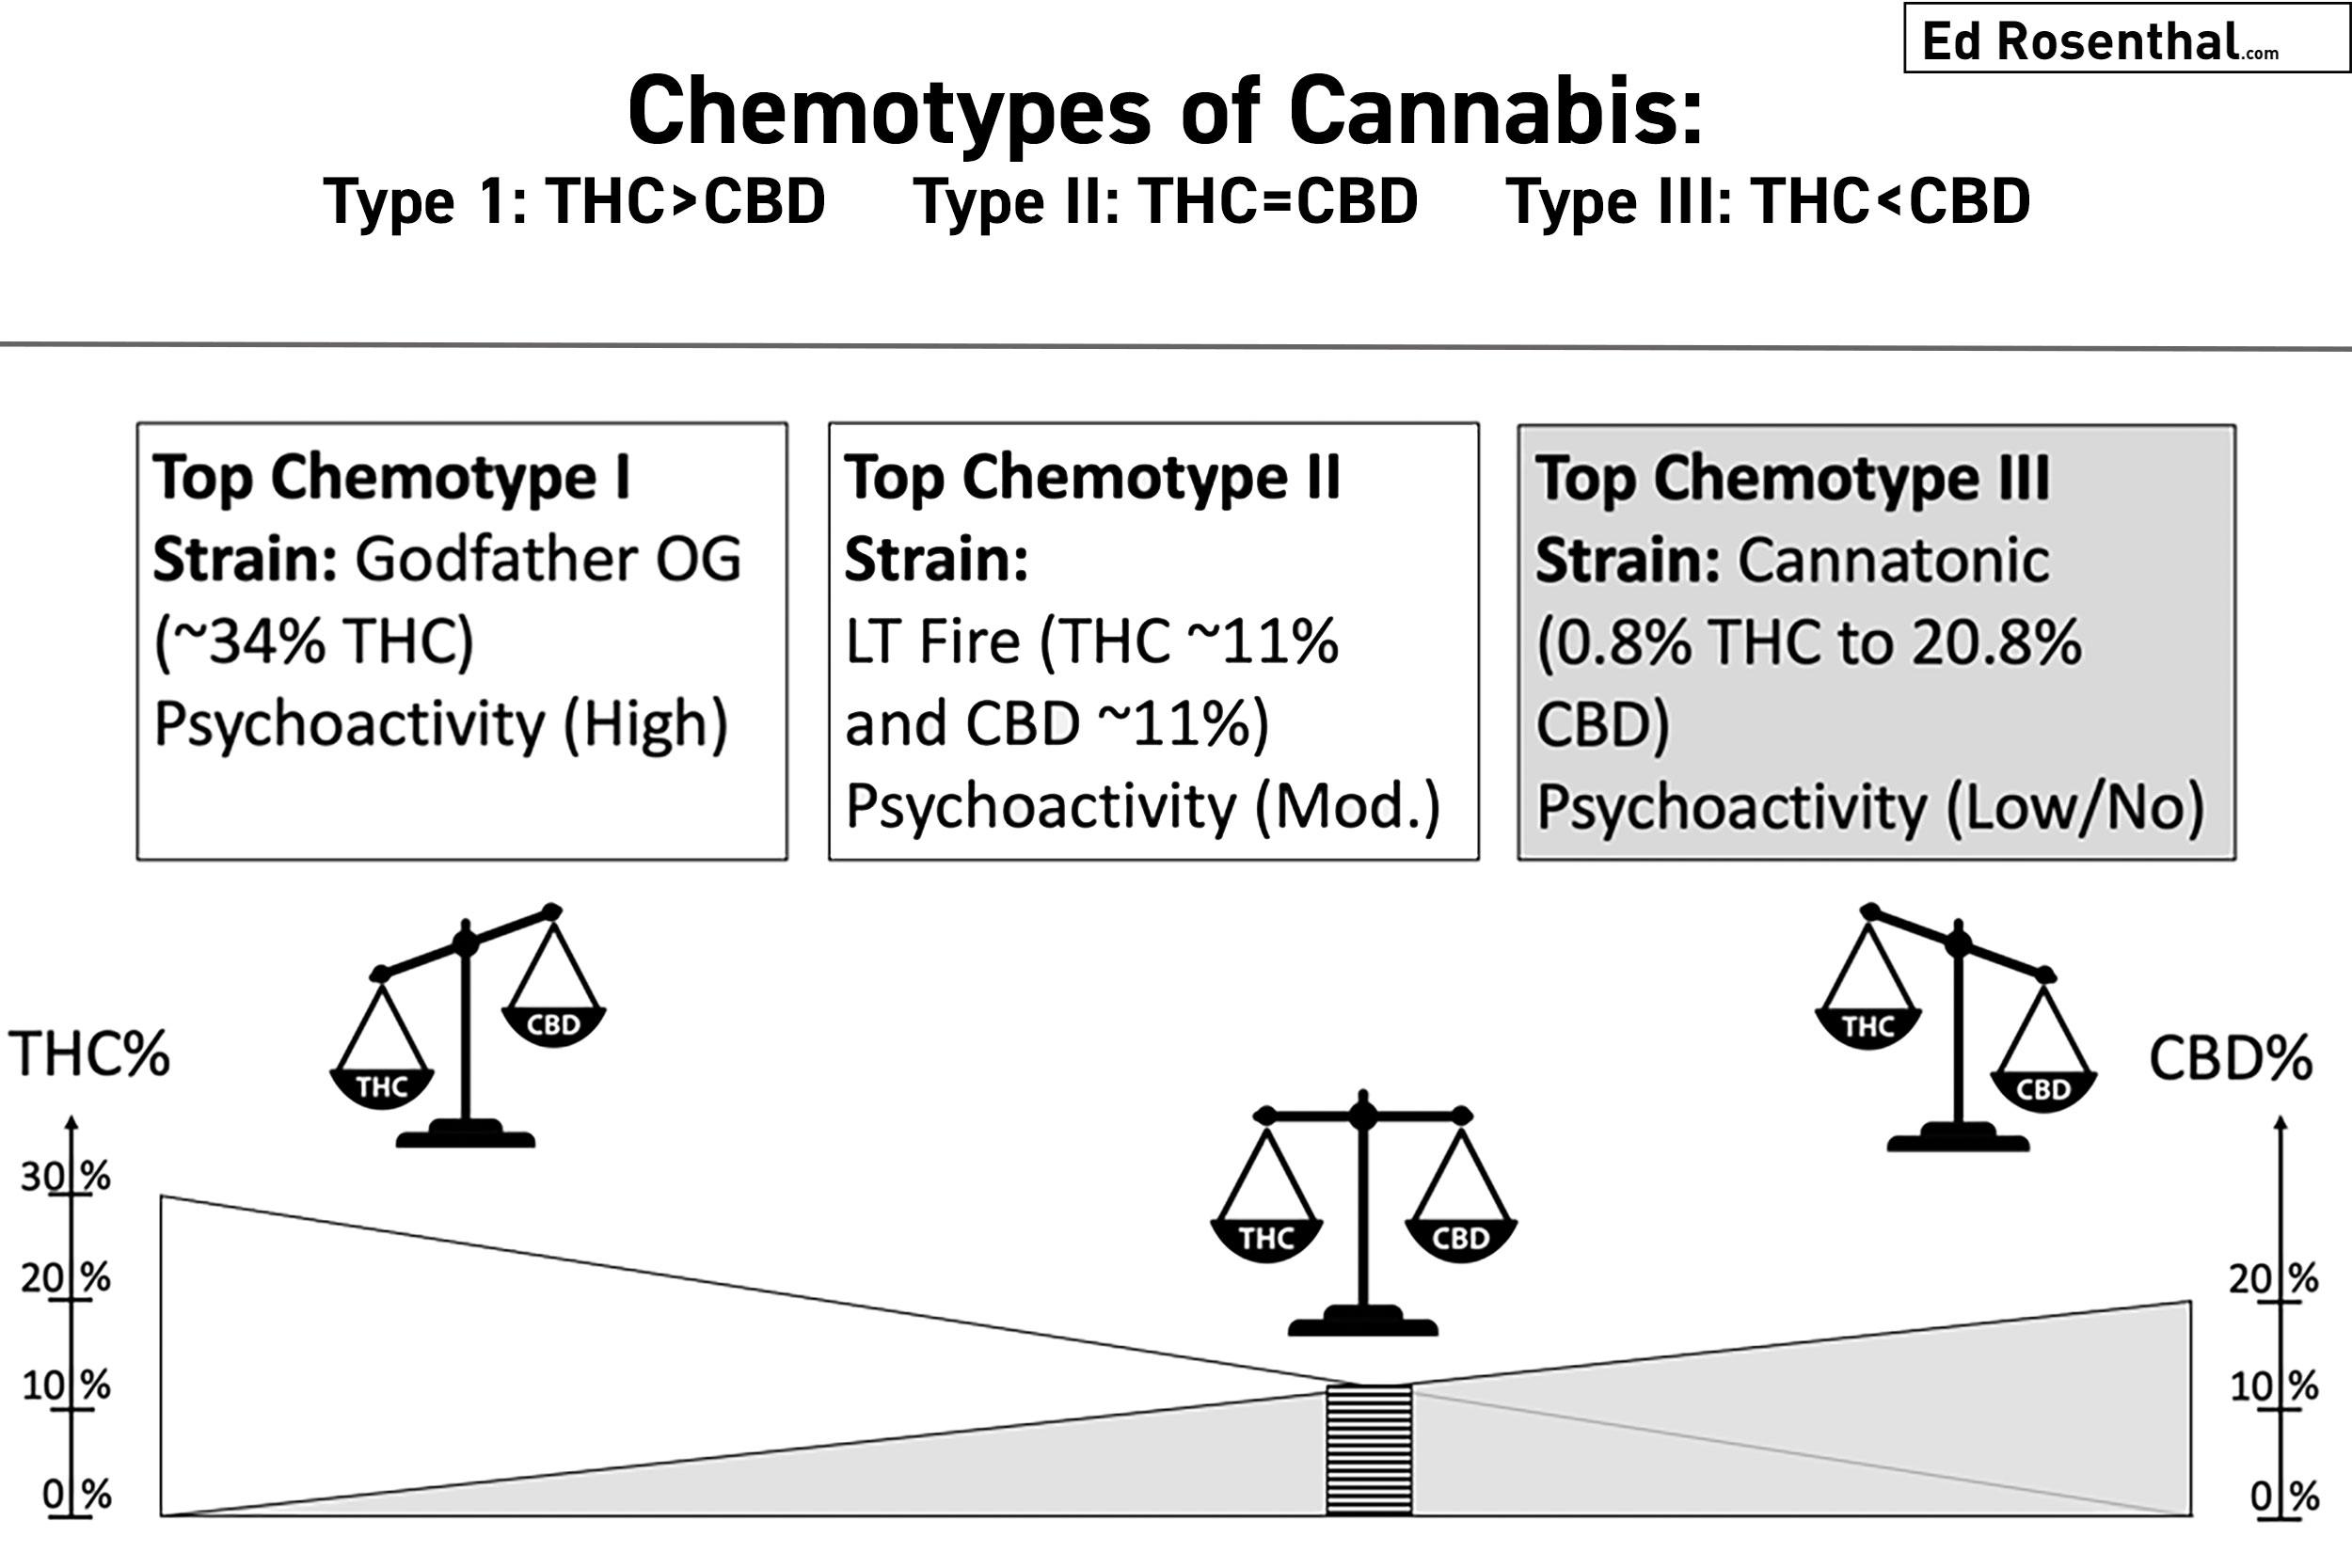 cananbis-chemotypes-ed-rosenthal-uwe-blesching.jpg